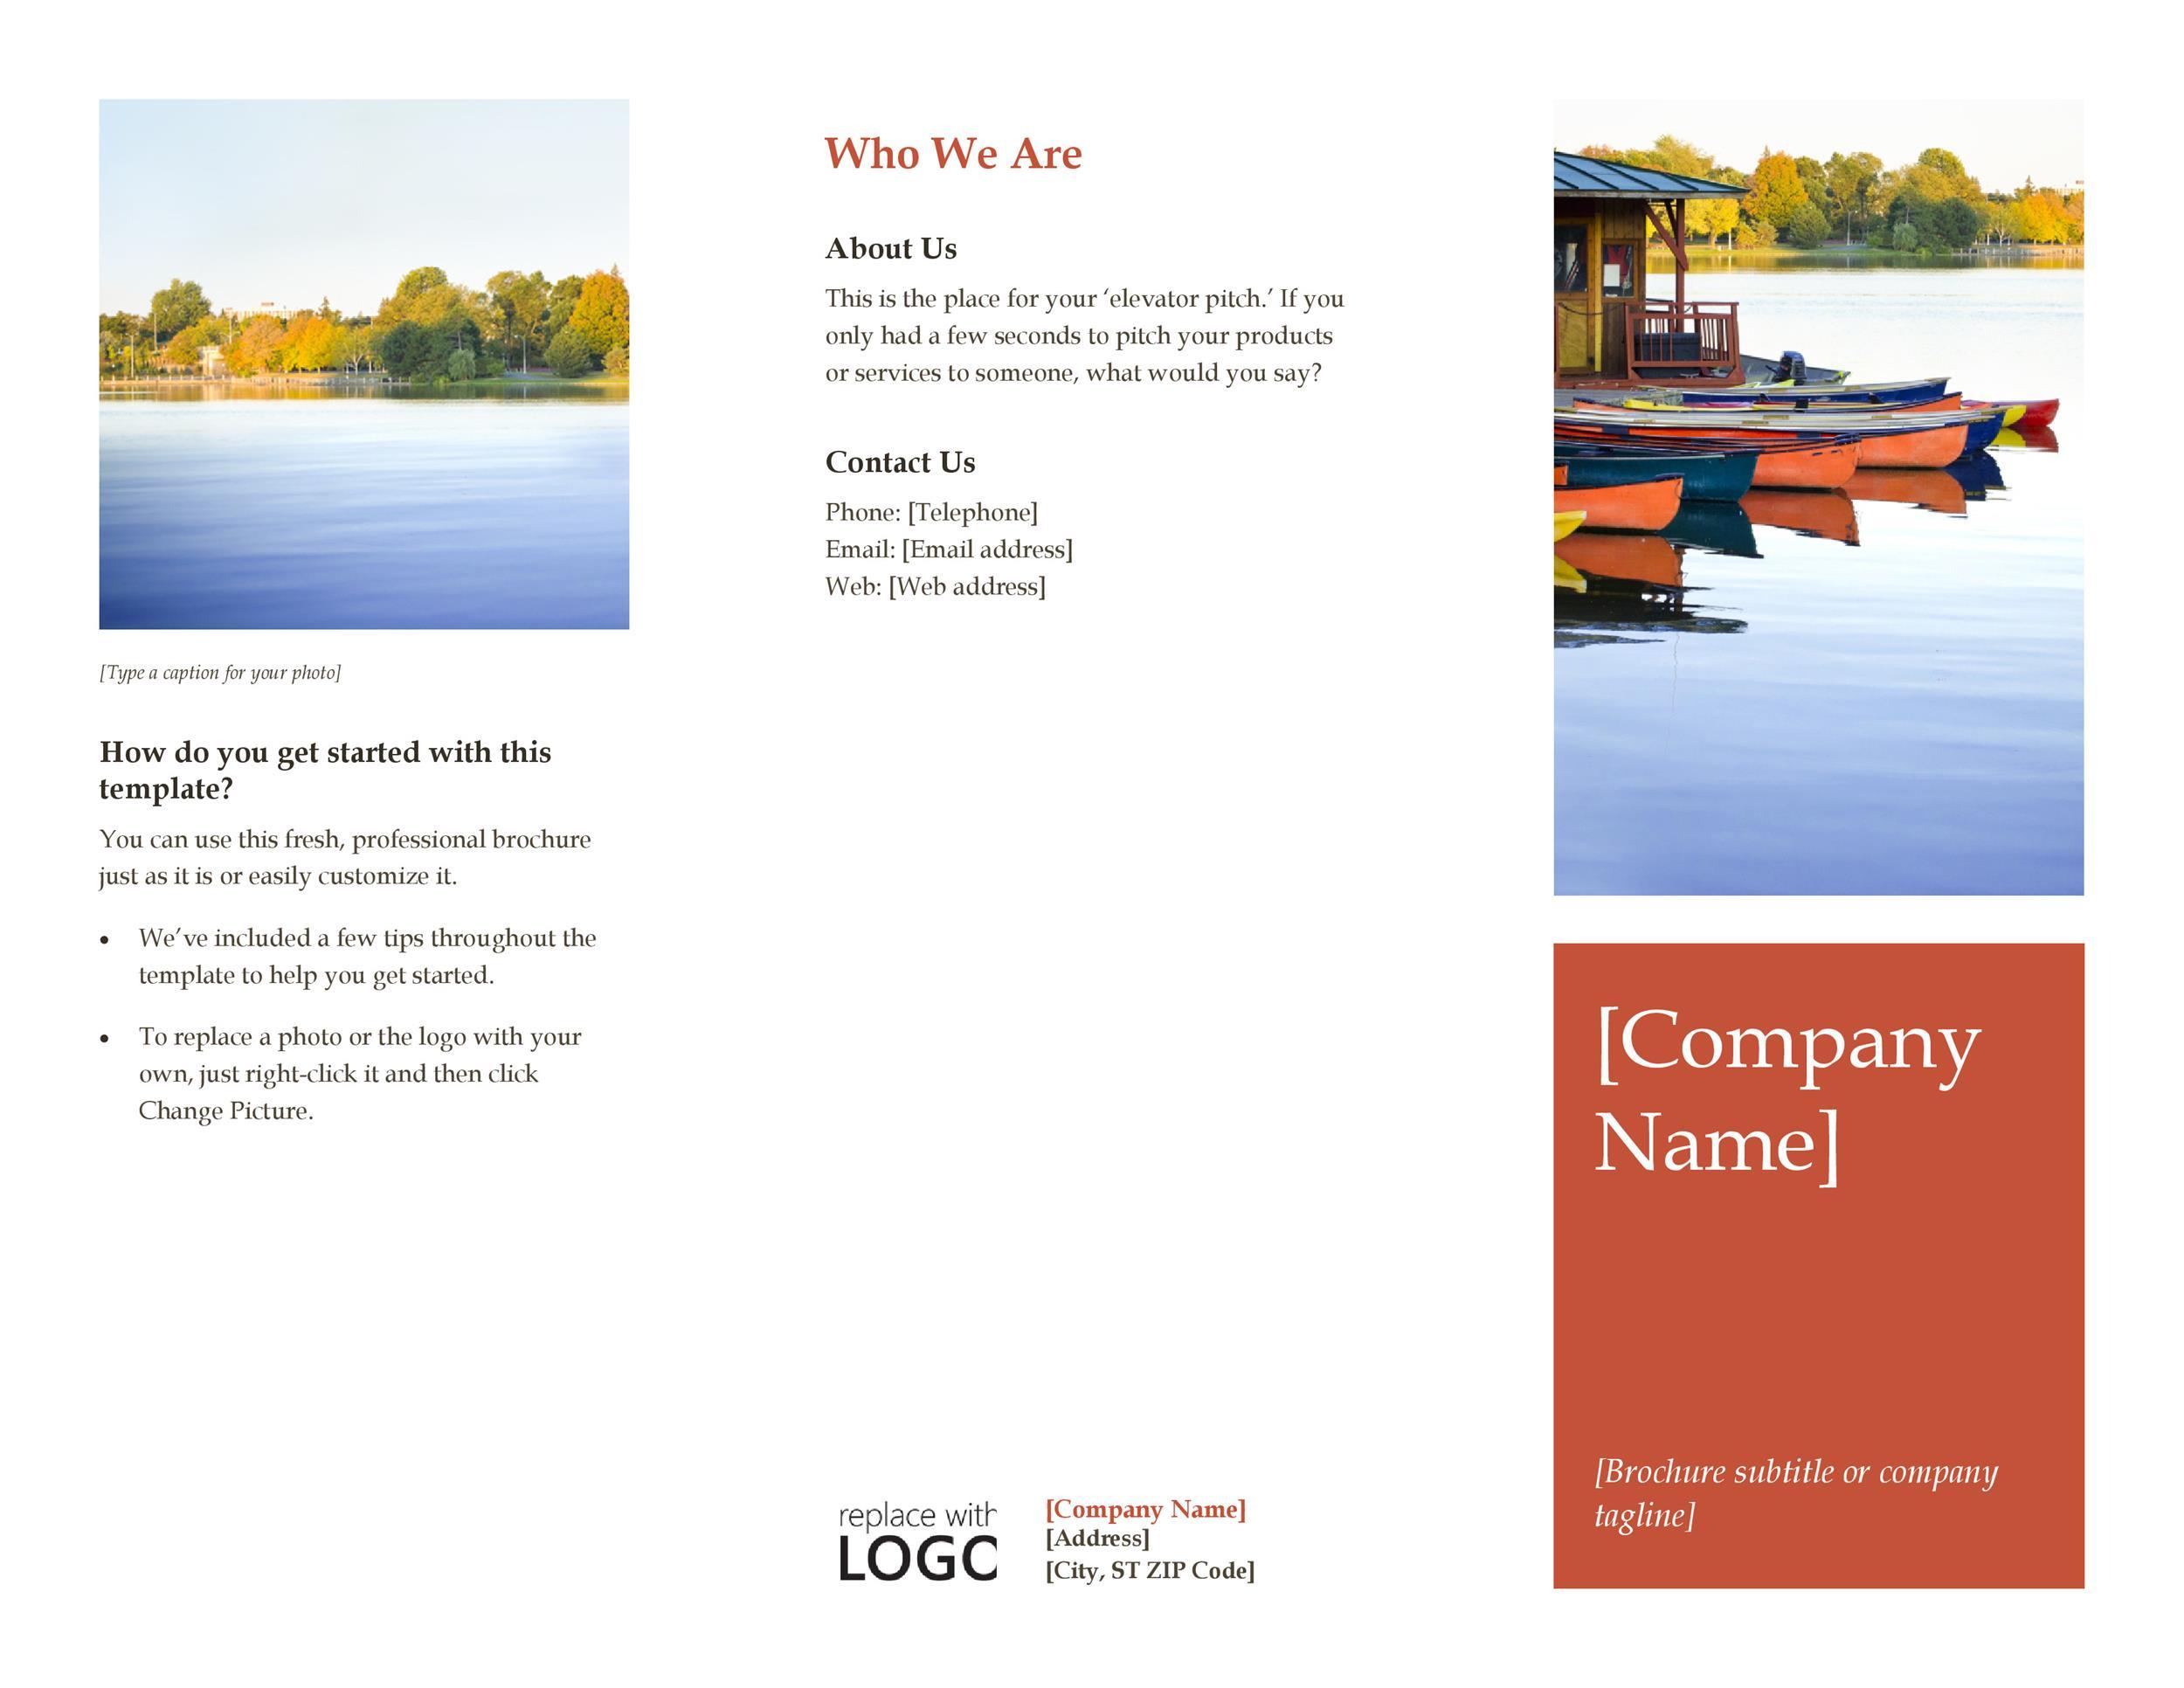 39 Amazing Company Brochure Templates & Examples [FREE] ᐅ